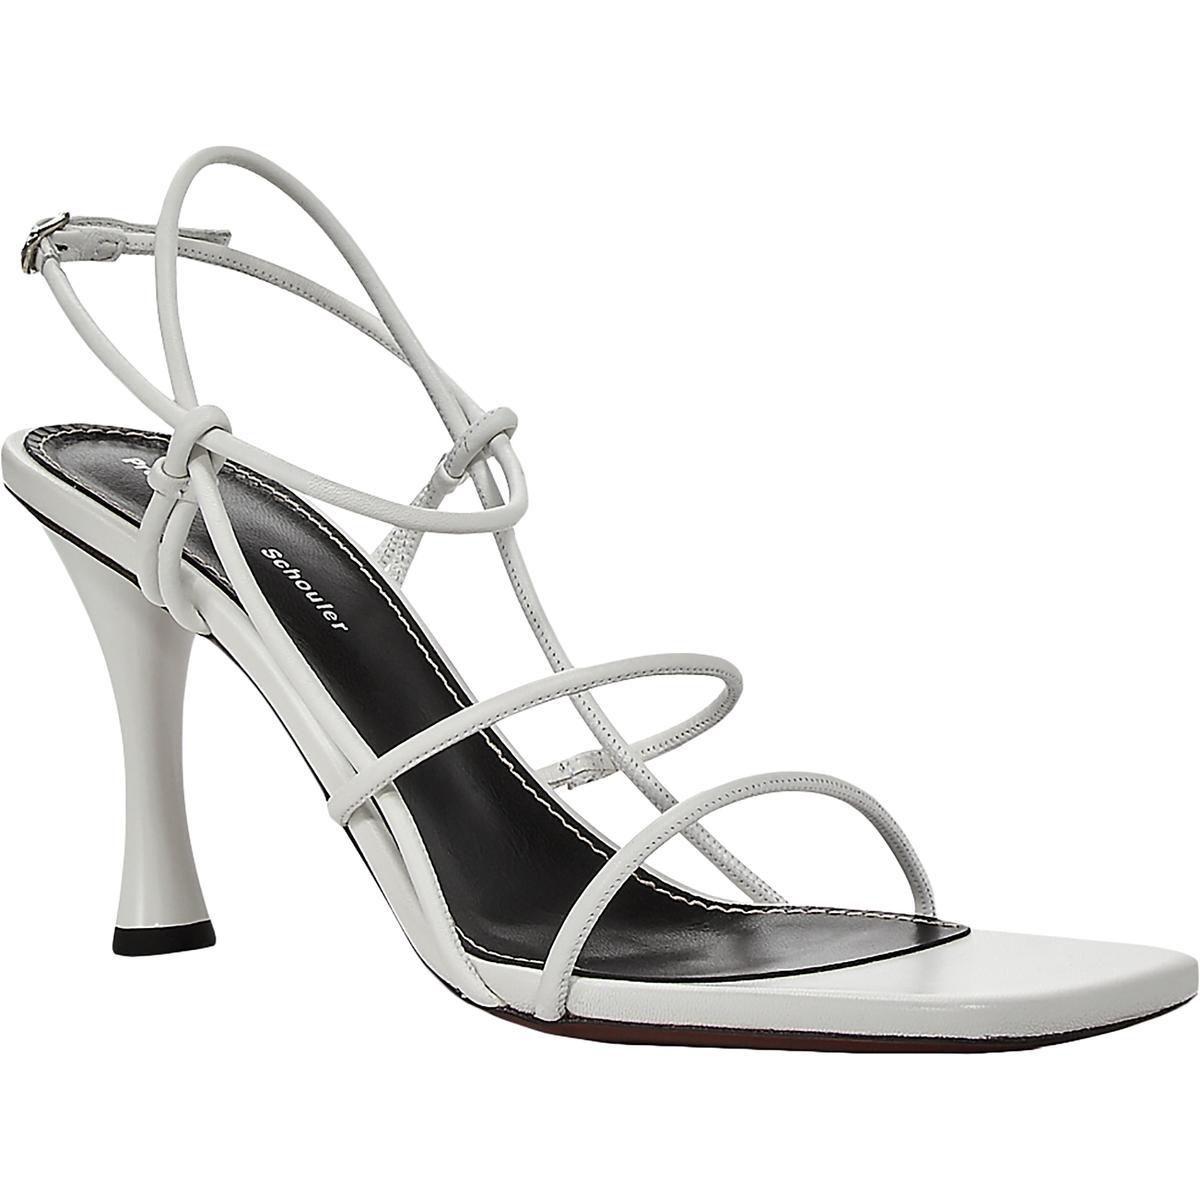 Proenza Schouler Womens Dress Sandals White Size 40 Medium(B,M)